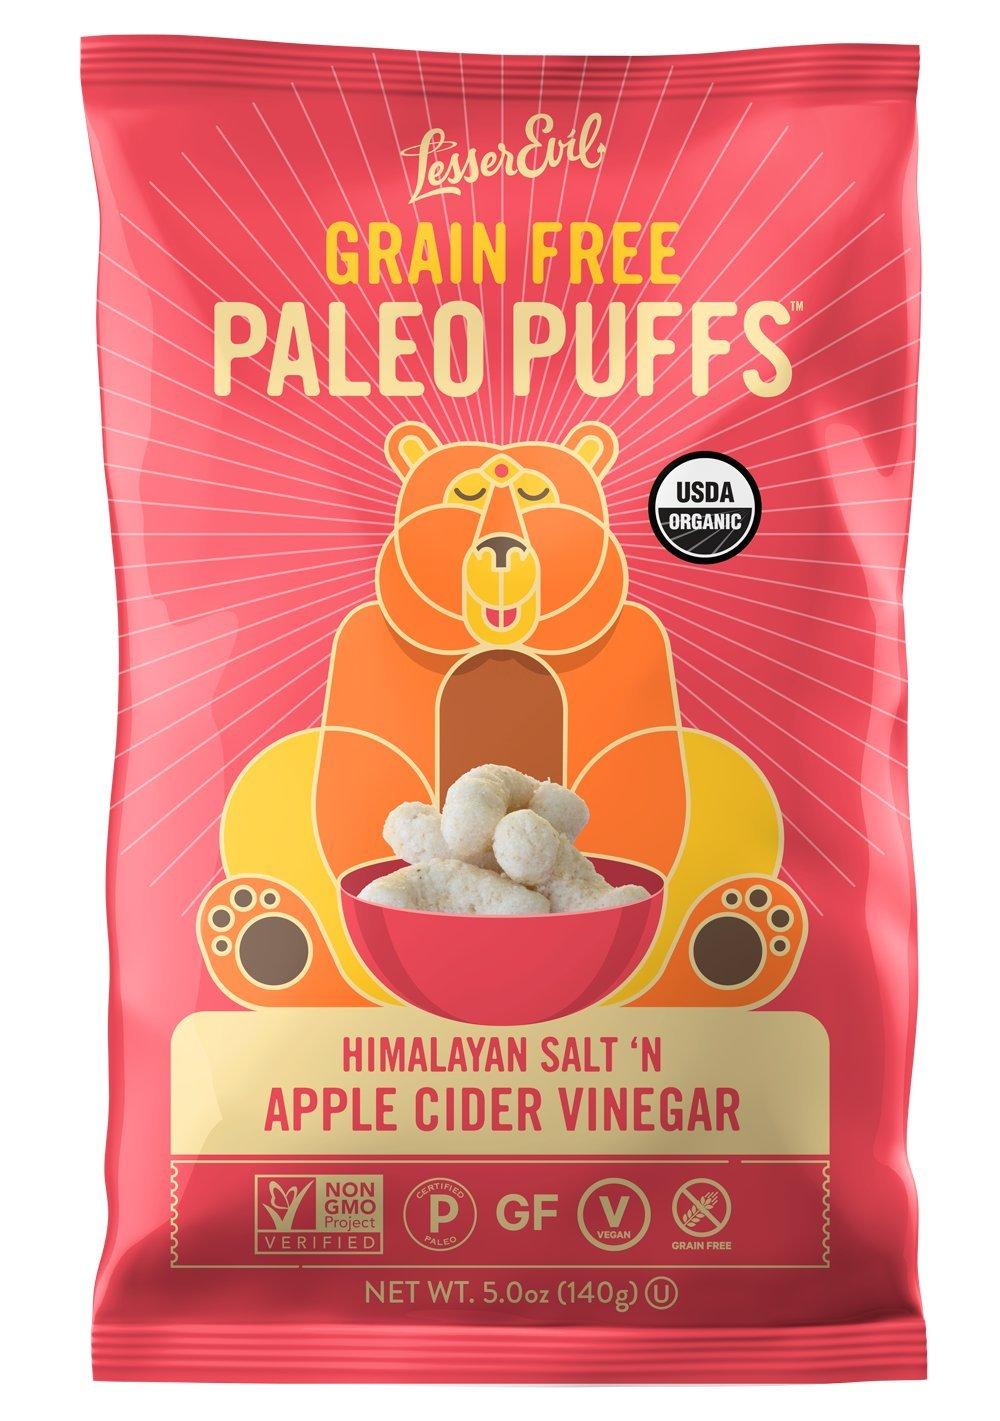 LesserEvil Grain Free Vegan Paleo Puffs, Himalayan Salt + Apple Cider Vinegar, 5 Ounce, 1 Count